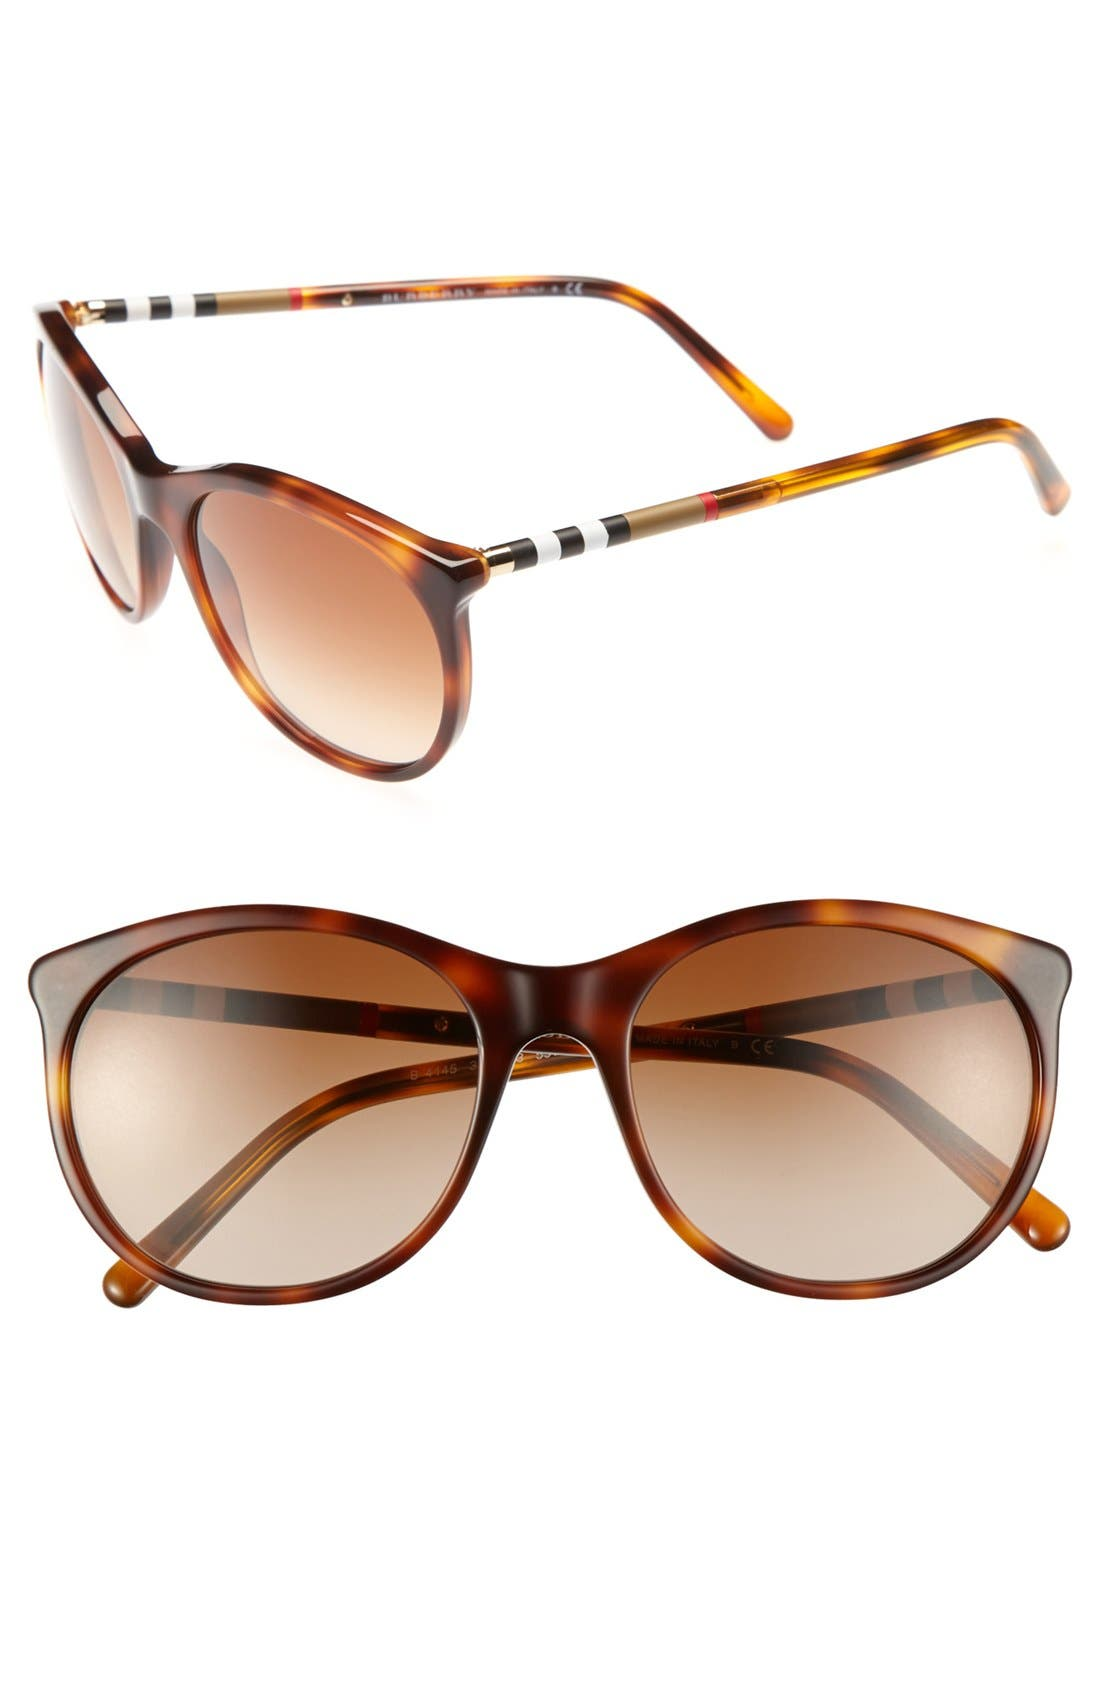 Alternate Image 1 Selected - Burberry 55mm Cat Eye Sunglasses